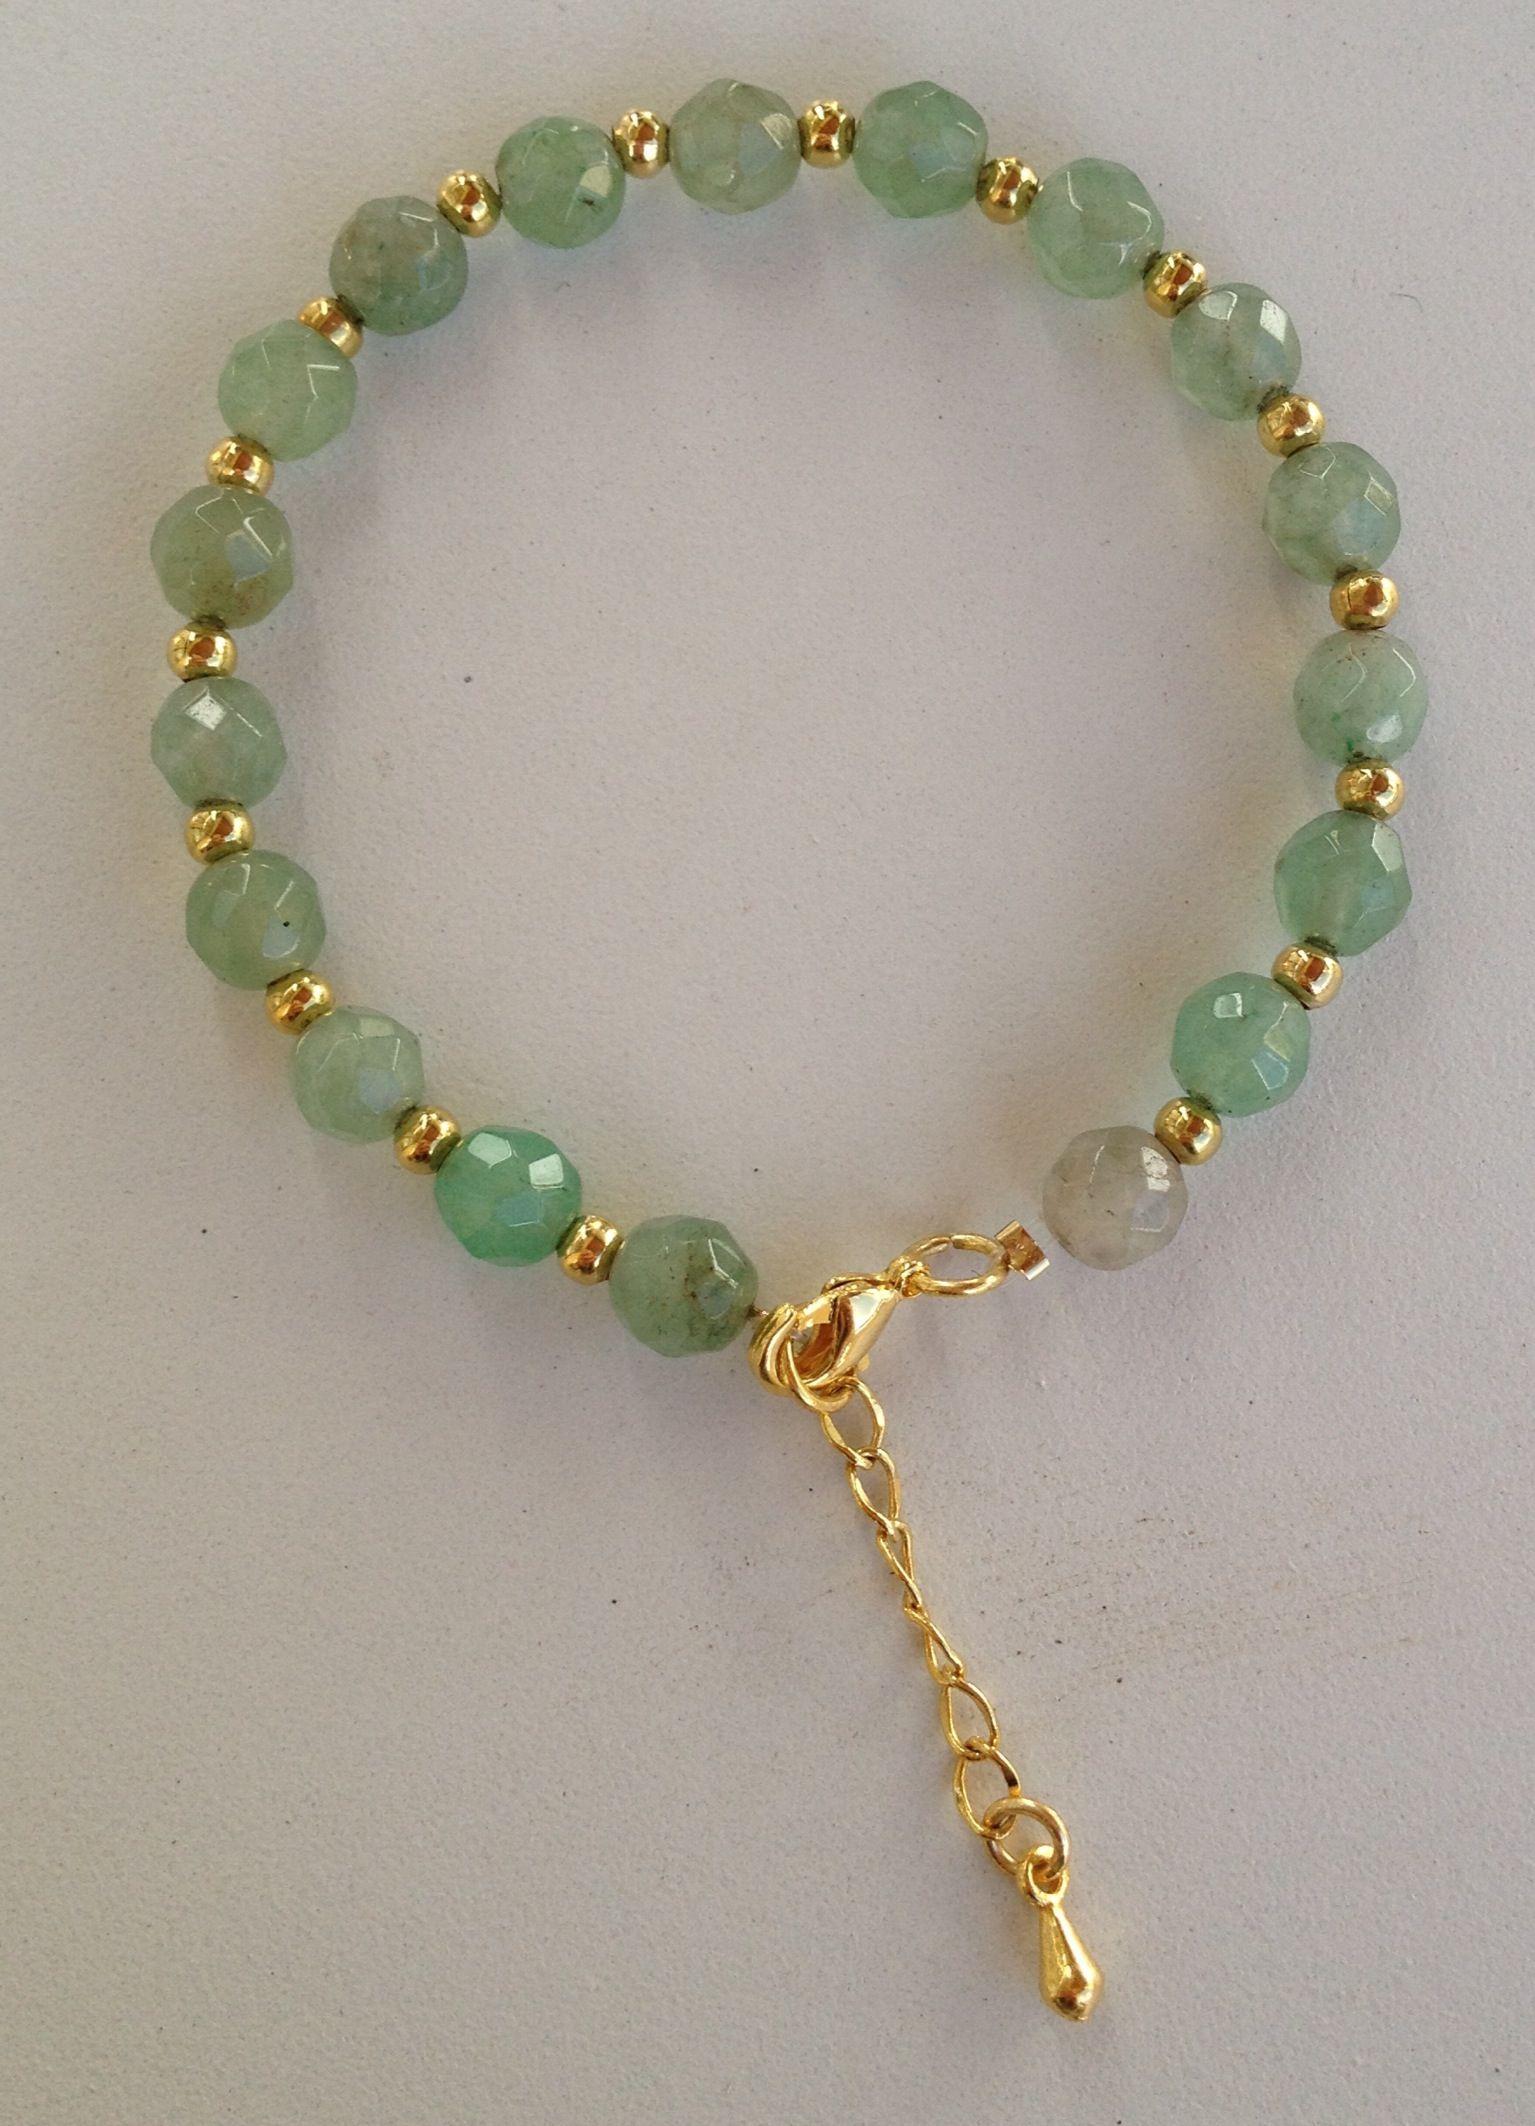 875a704bfd9d Green jade beaded bracelet pulseira de jade verde